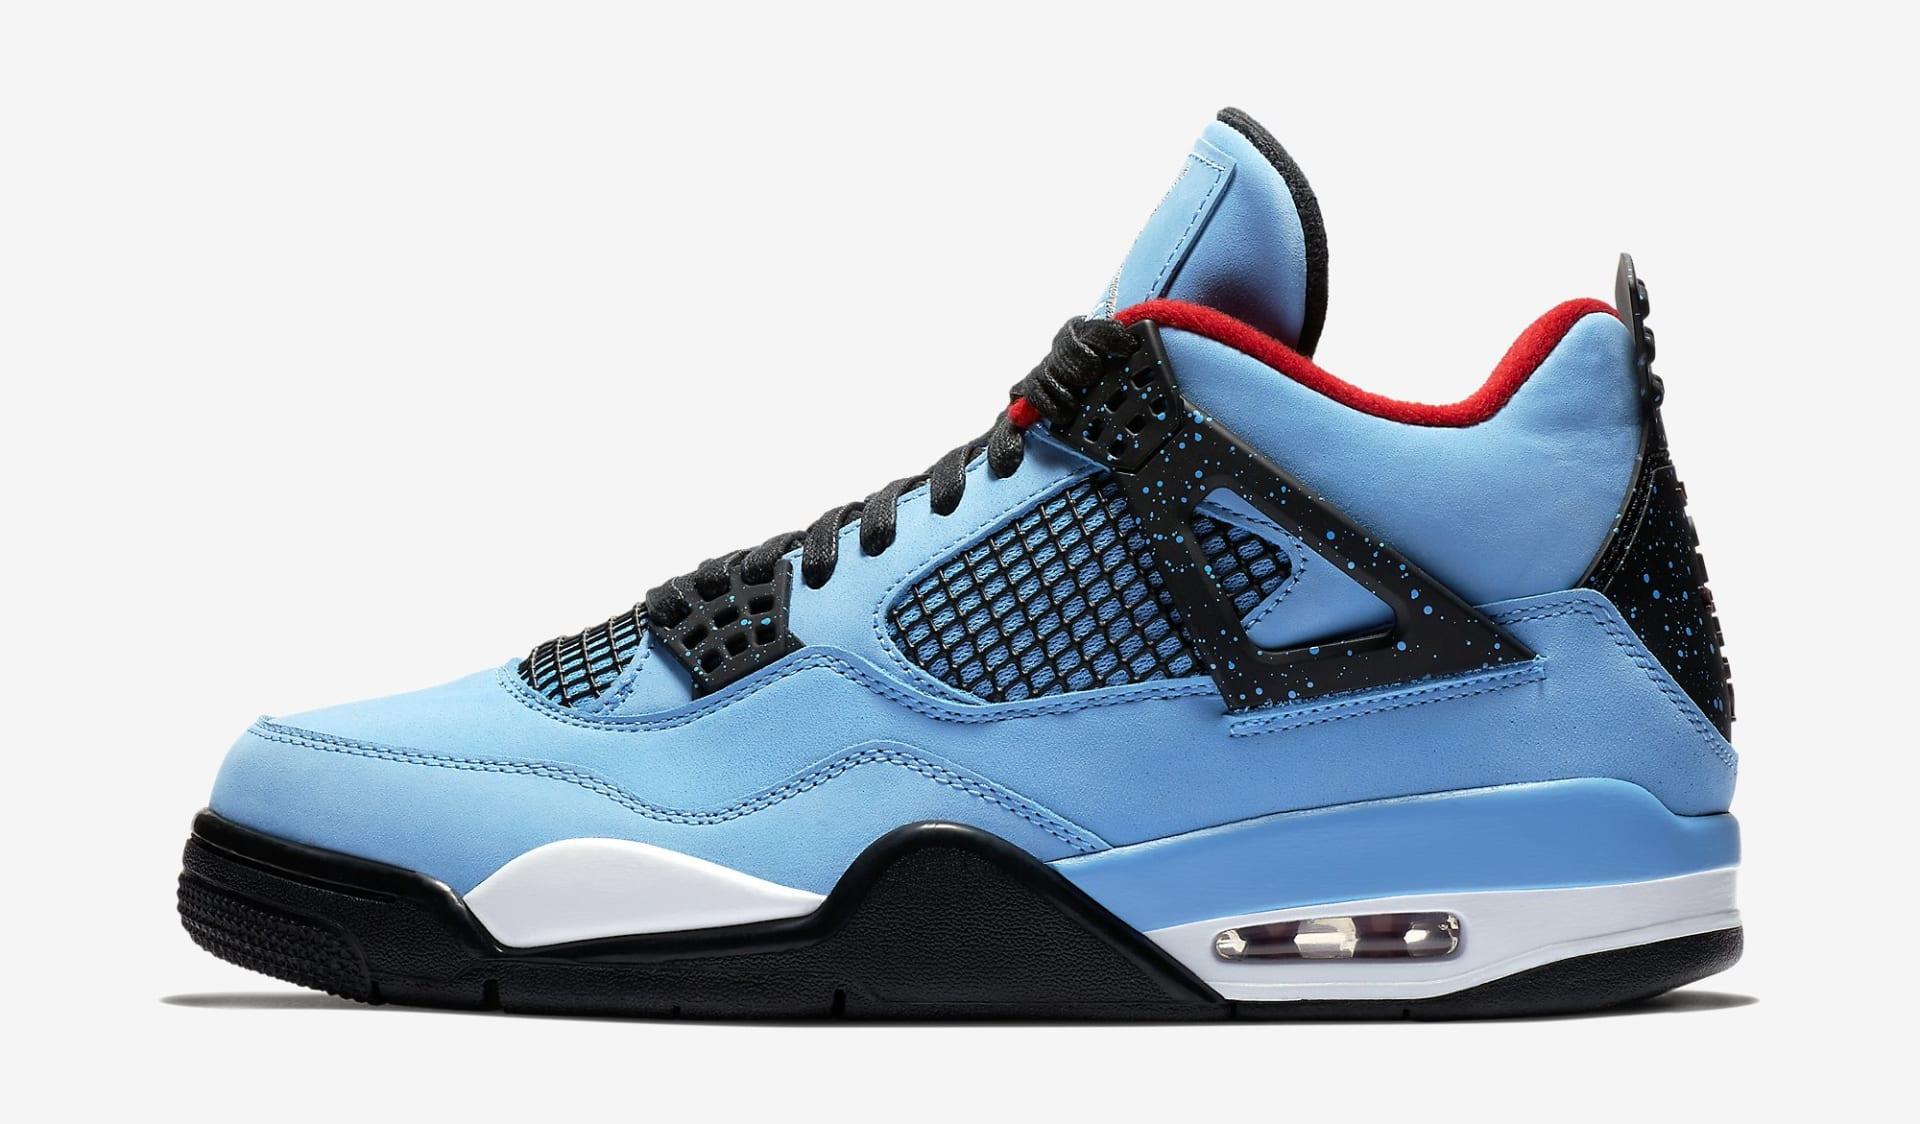 ca50b01a94fb The Best Air Jordans of 2018